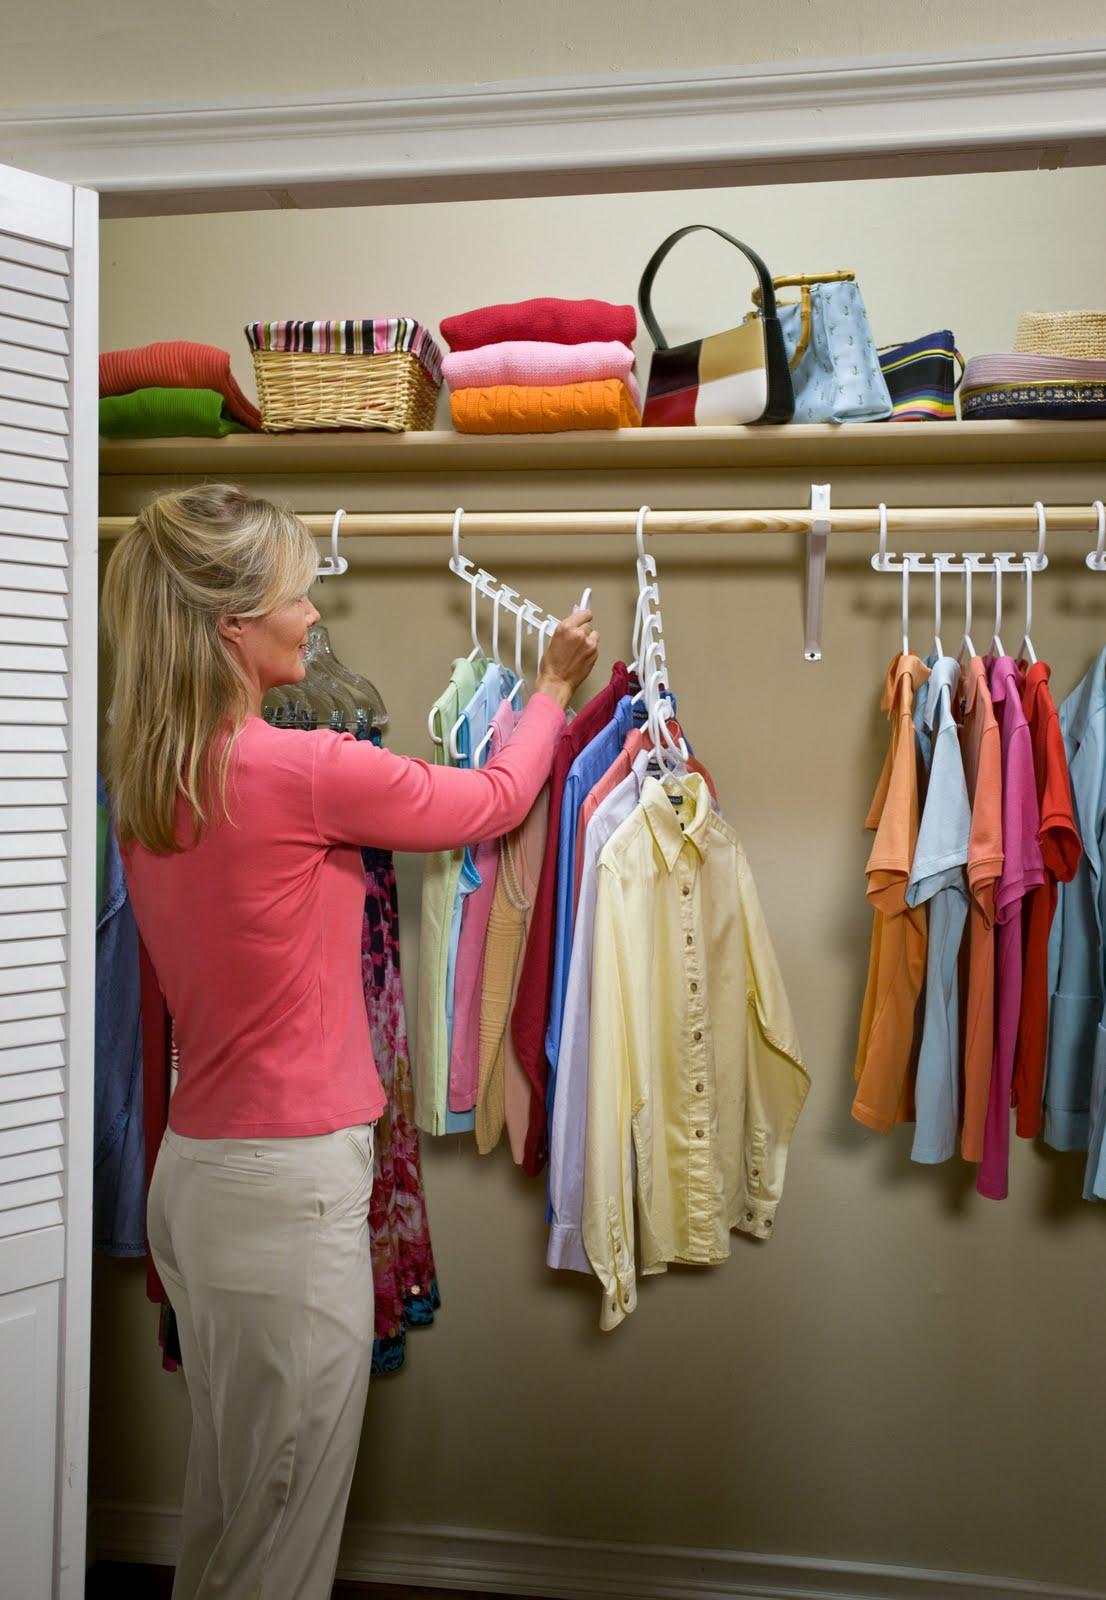 6-interior-for-elderly-woman-closet-clothes